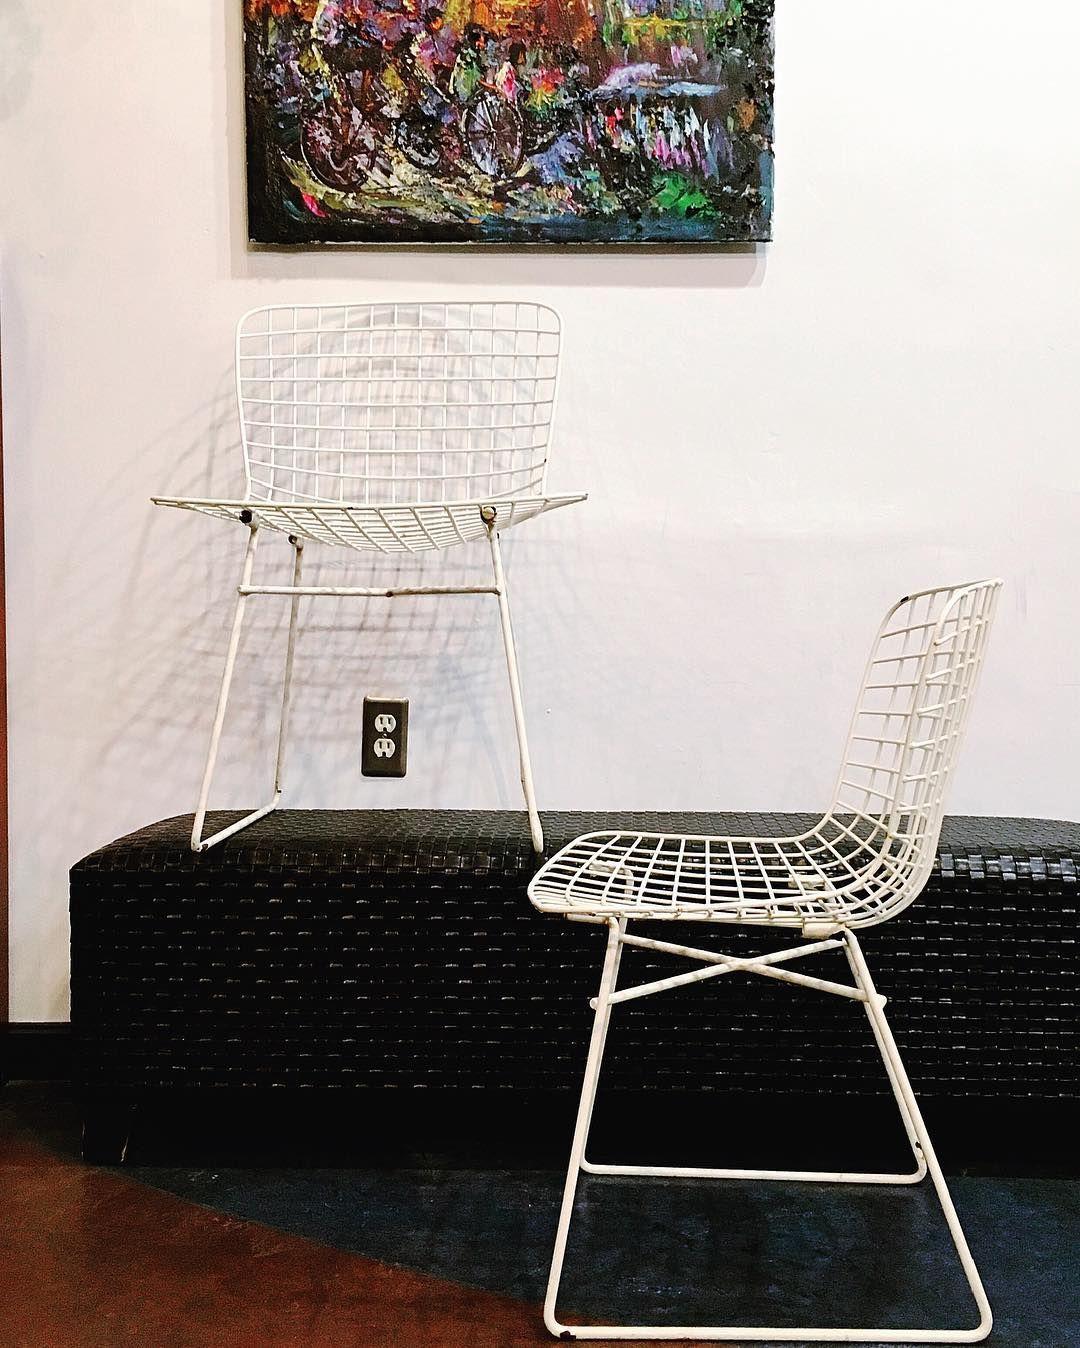 harrybertoia #midcenturymodern #chair #iconic #wire #furniture #mod ...